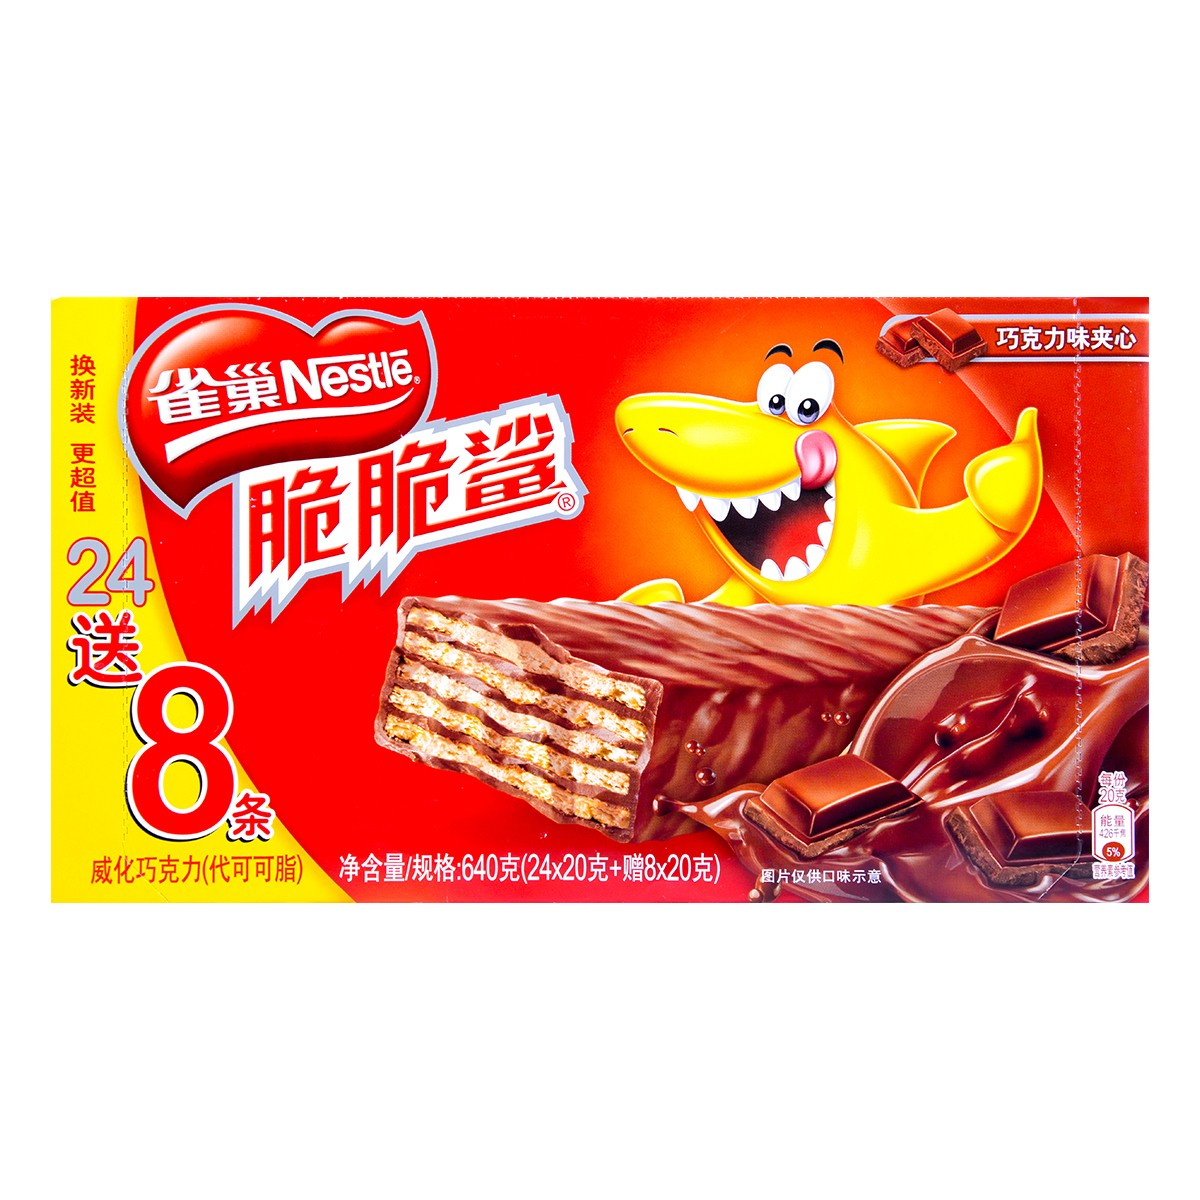 NESTLE雀巢 脆脆鲨 威化巧克力 640g